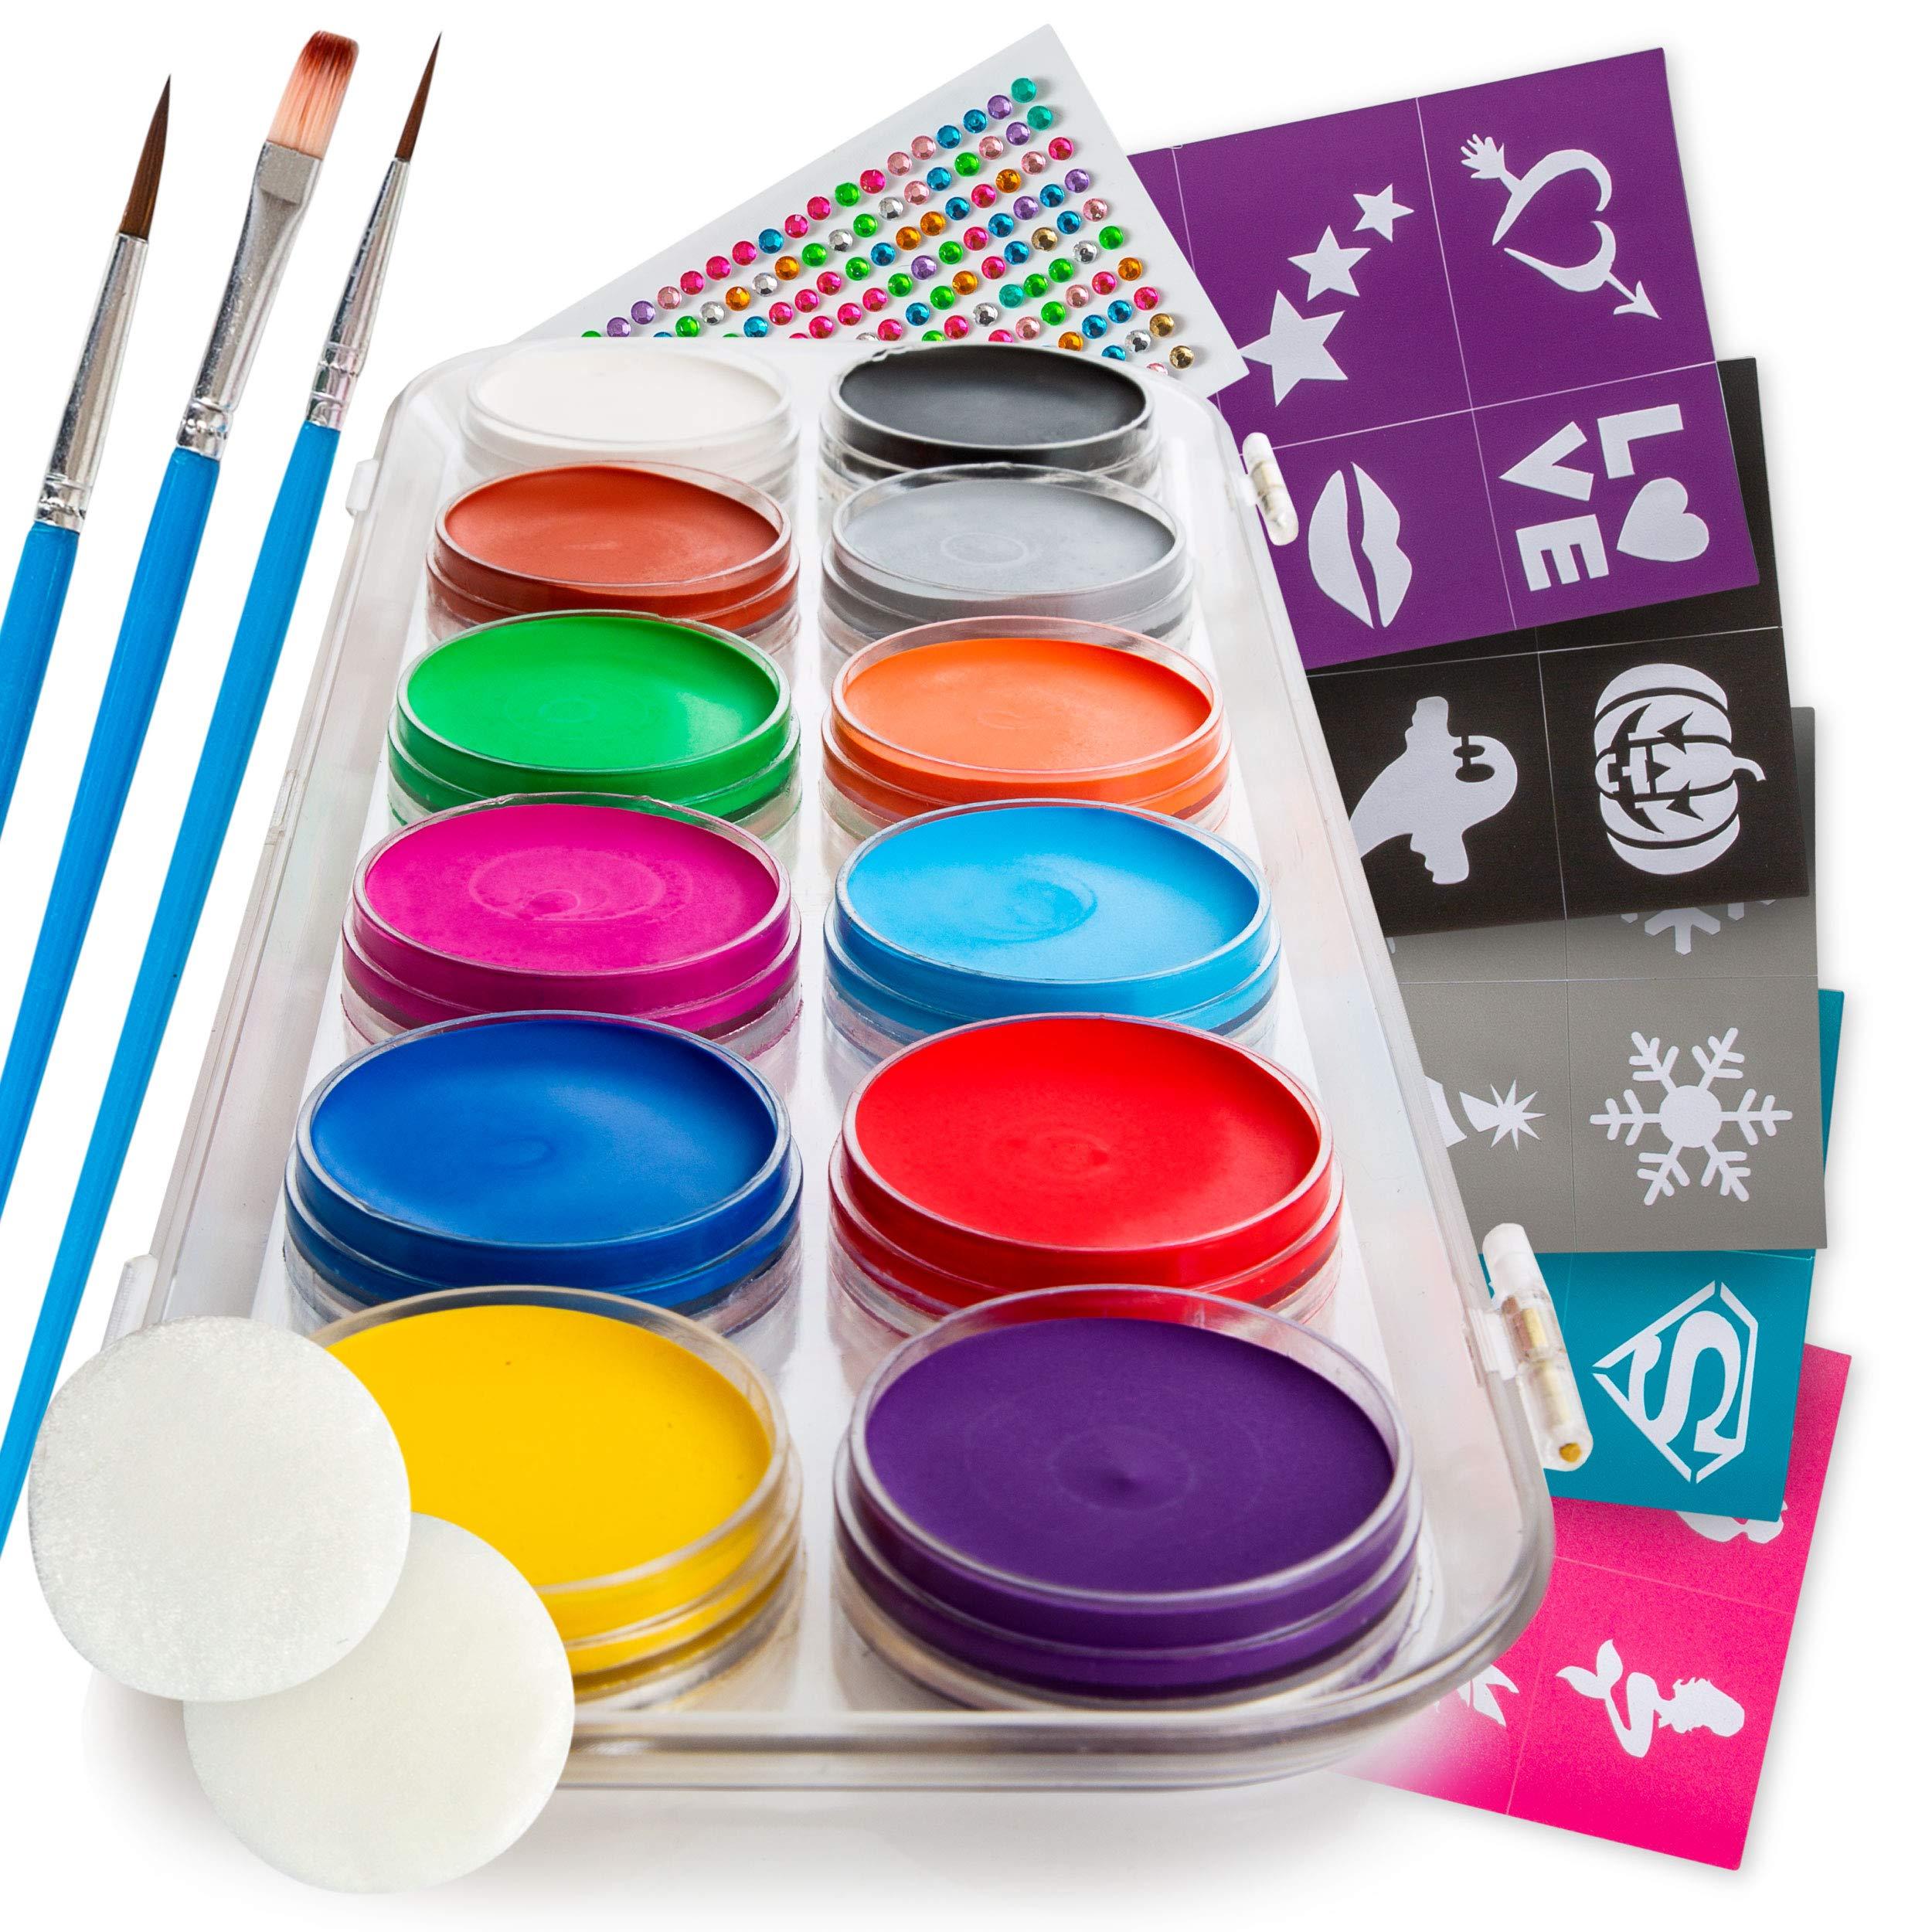 B&E Artt Face Painting Kit for Kids & Adults | Bonus Rhinestone Stickers | 40 Large Stencils, 3 Brushes & 2 Sponge Pads | Professional Face & Body Paints in 12 Vibrant Colors Safe for Sensitive Skin by B&E Artt